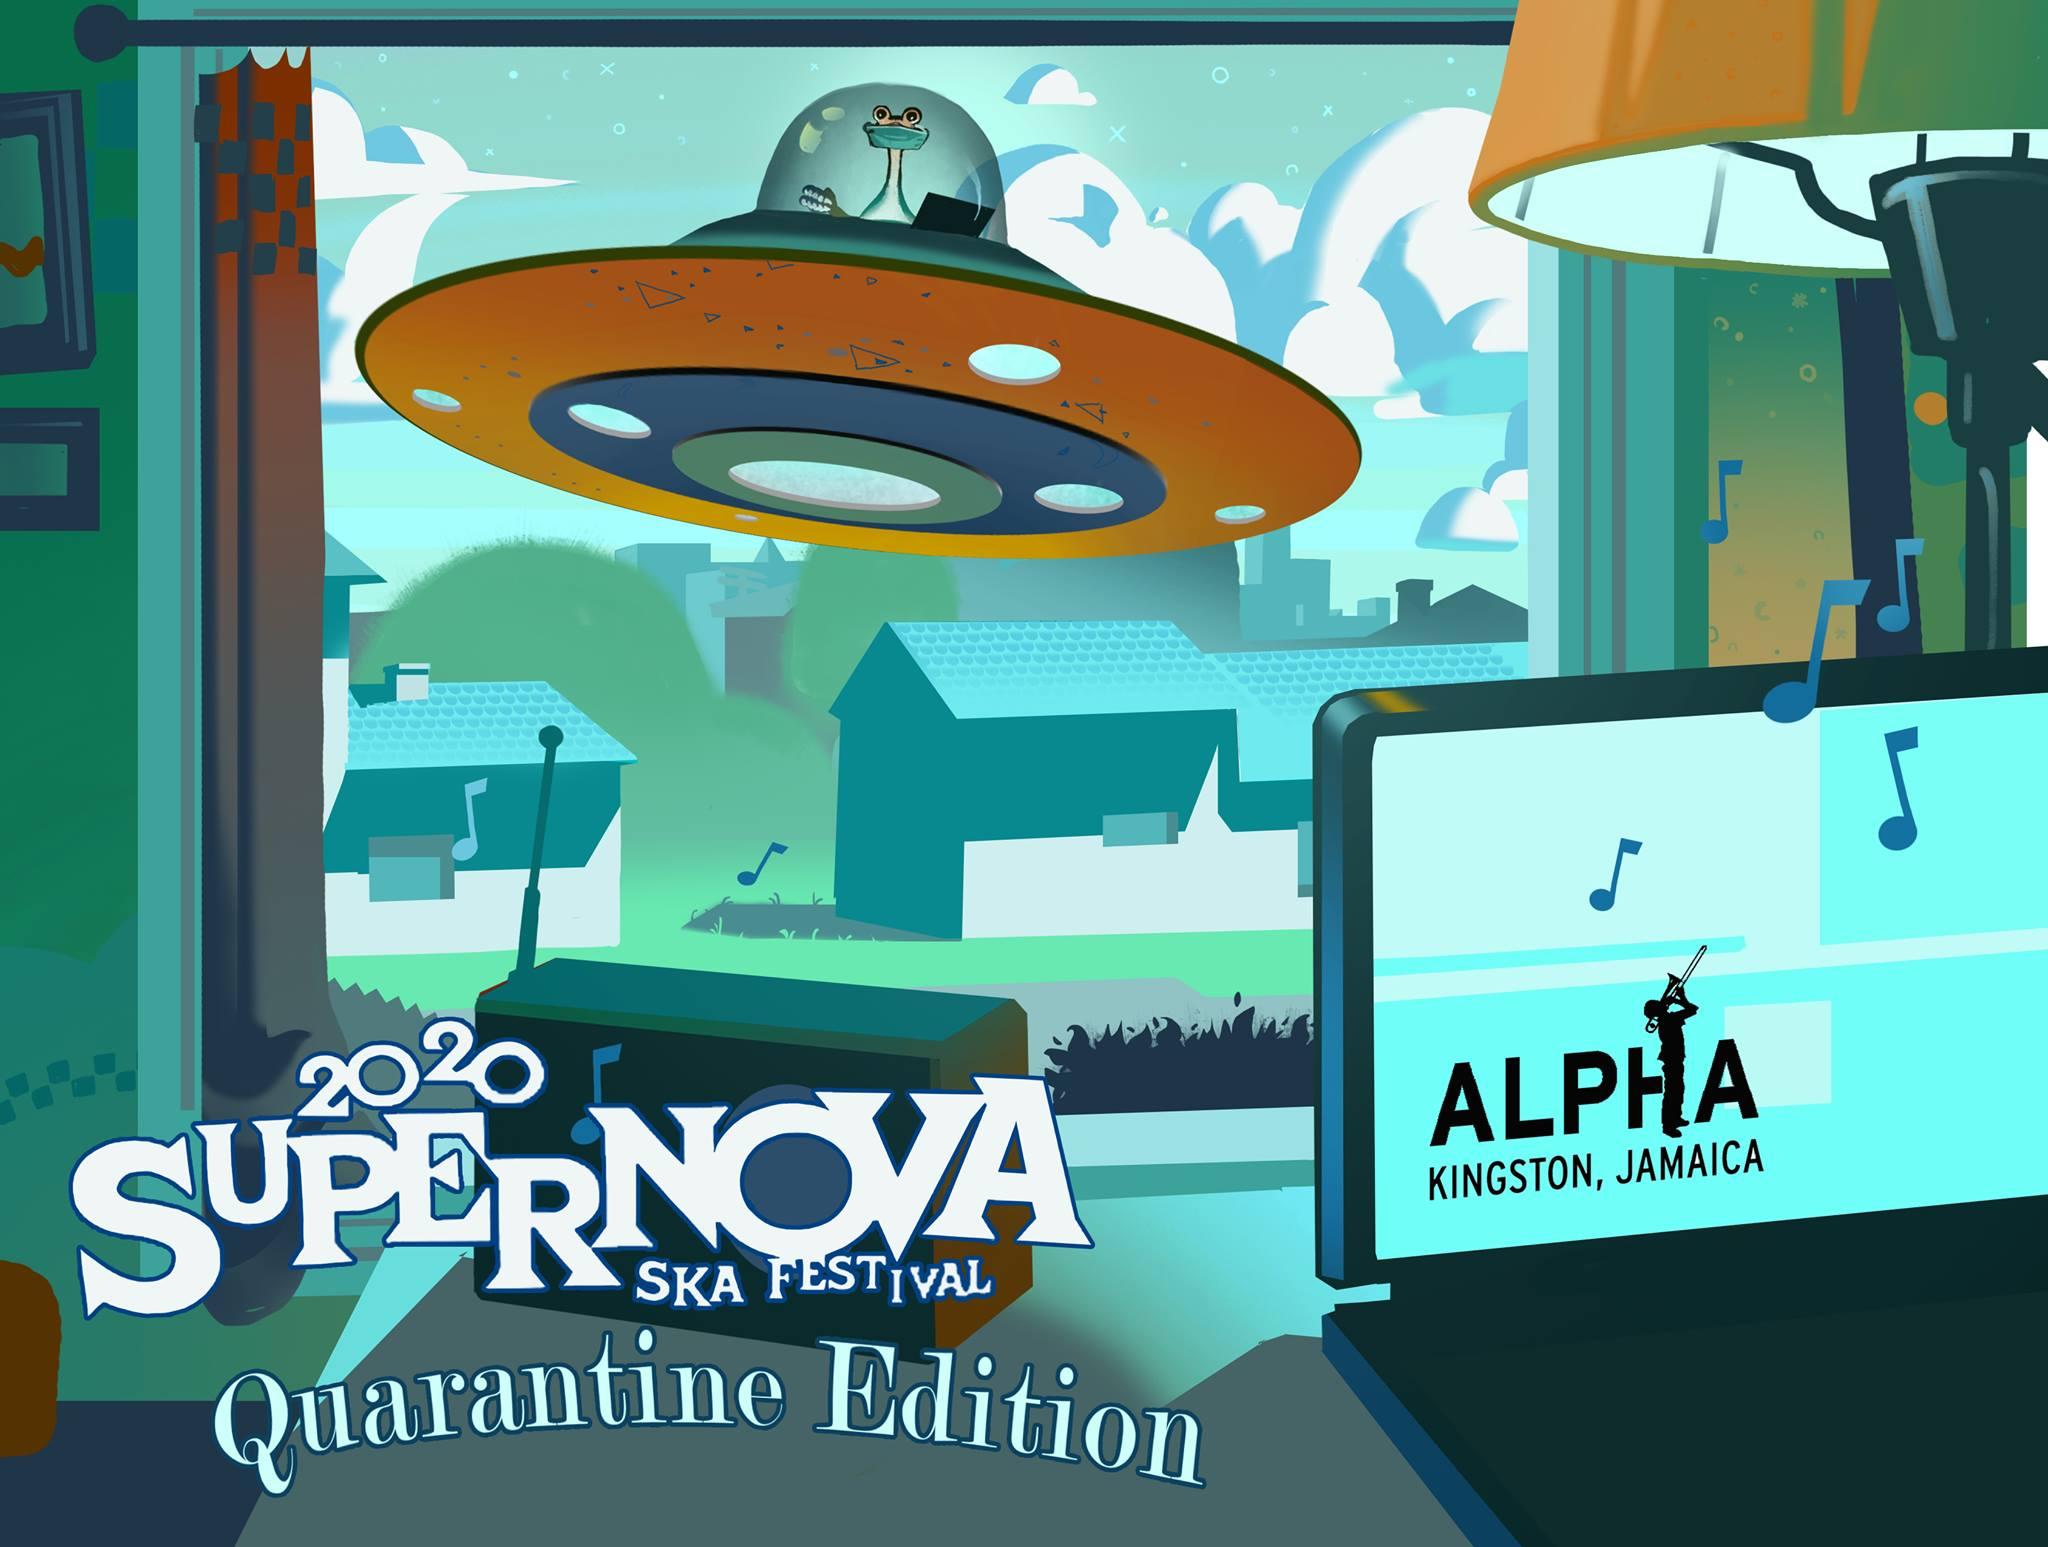 Grafika promująca festiwal Supernova